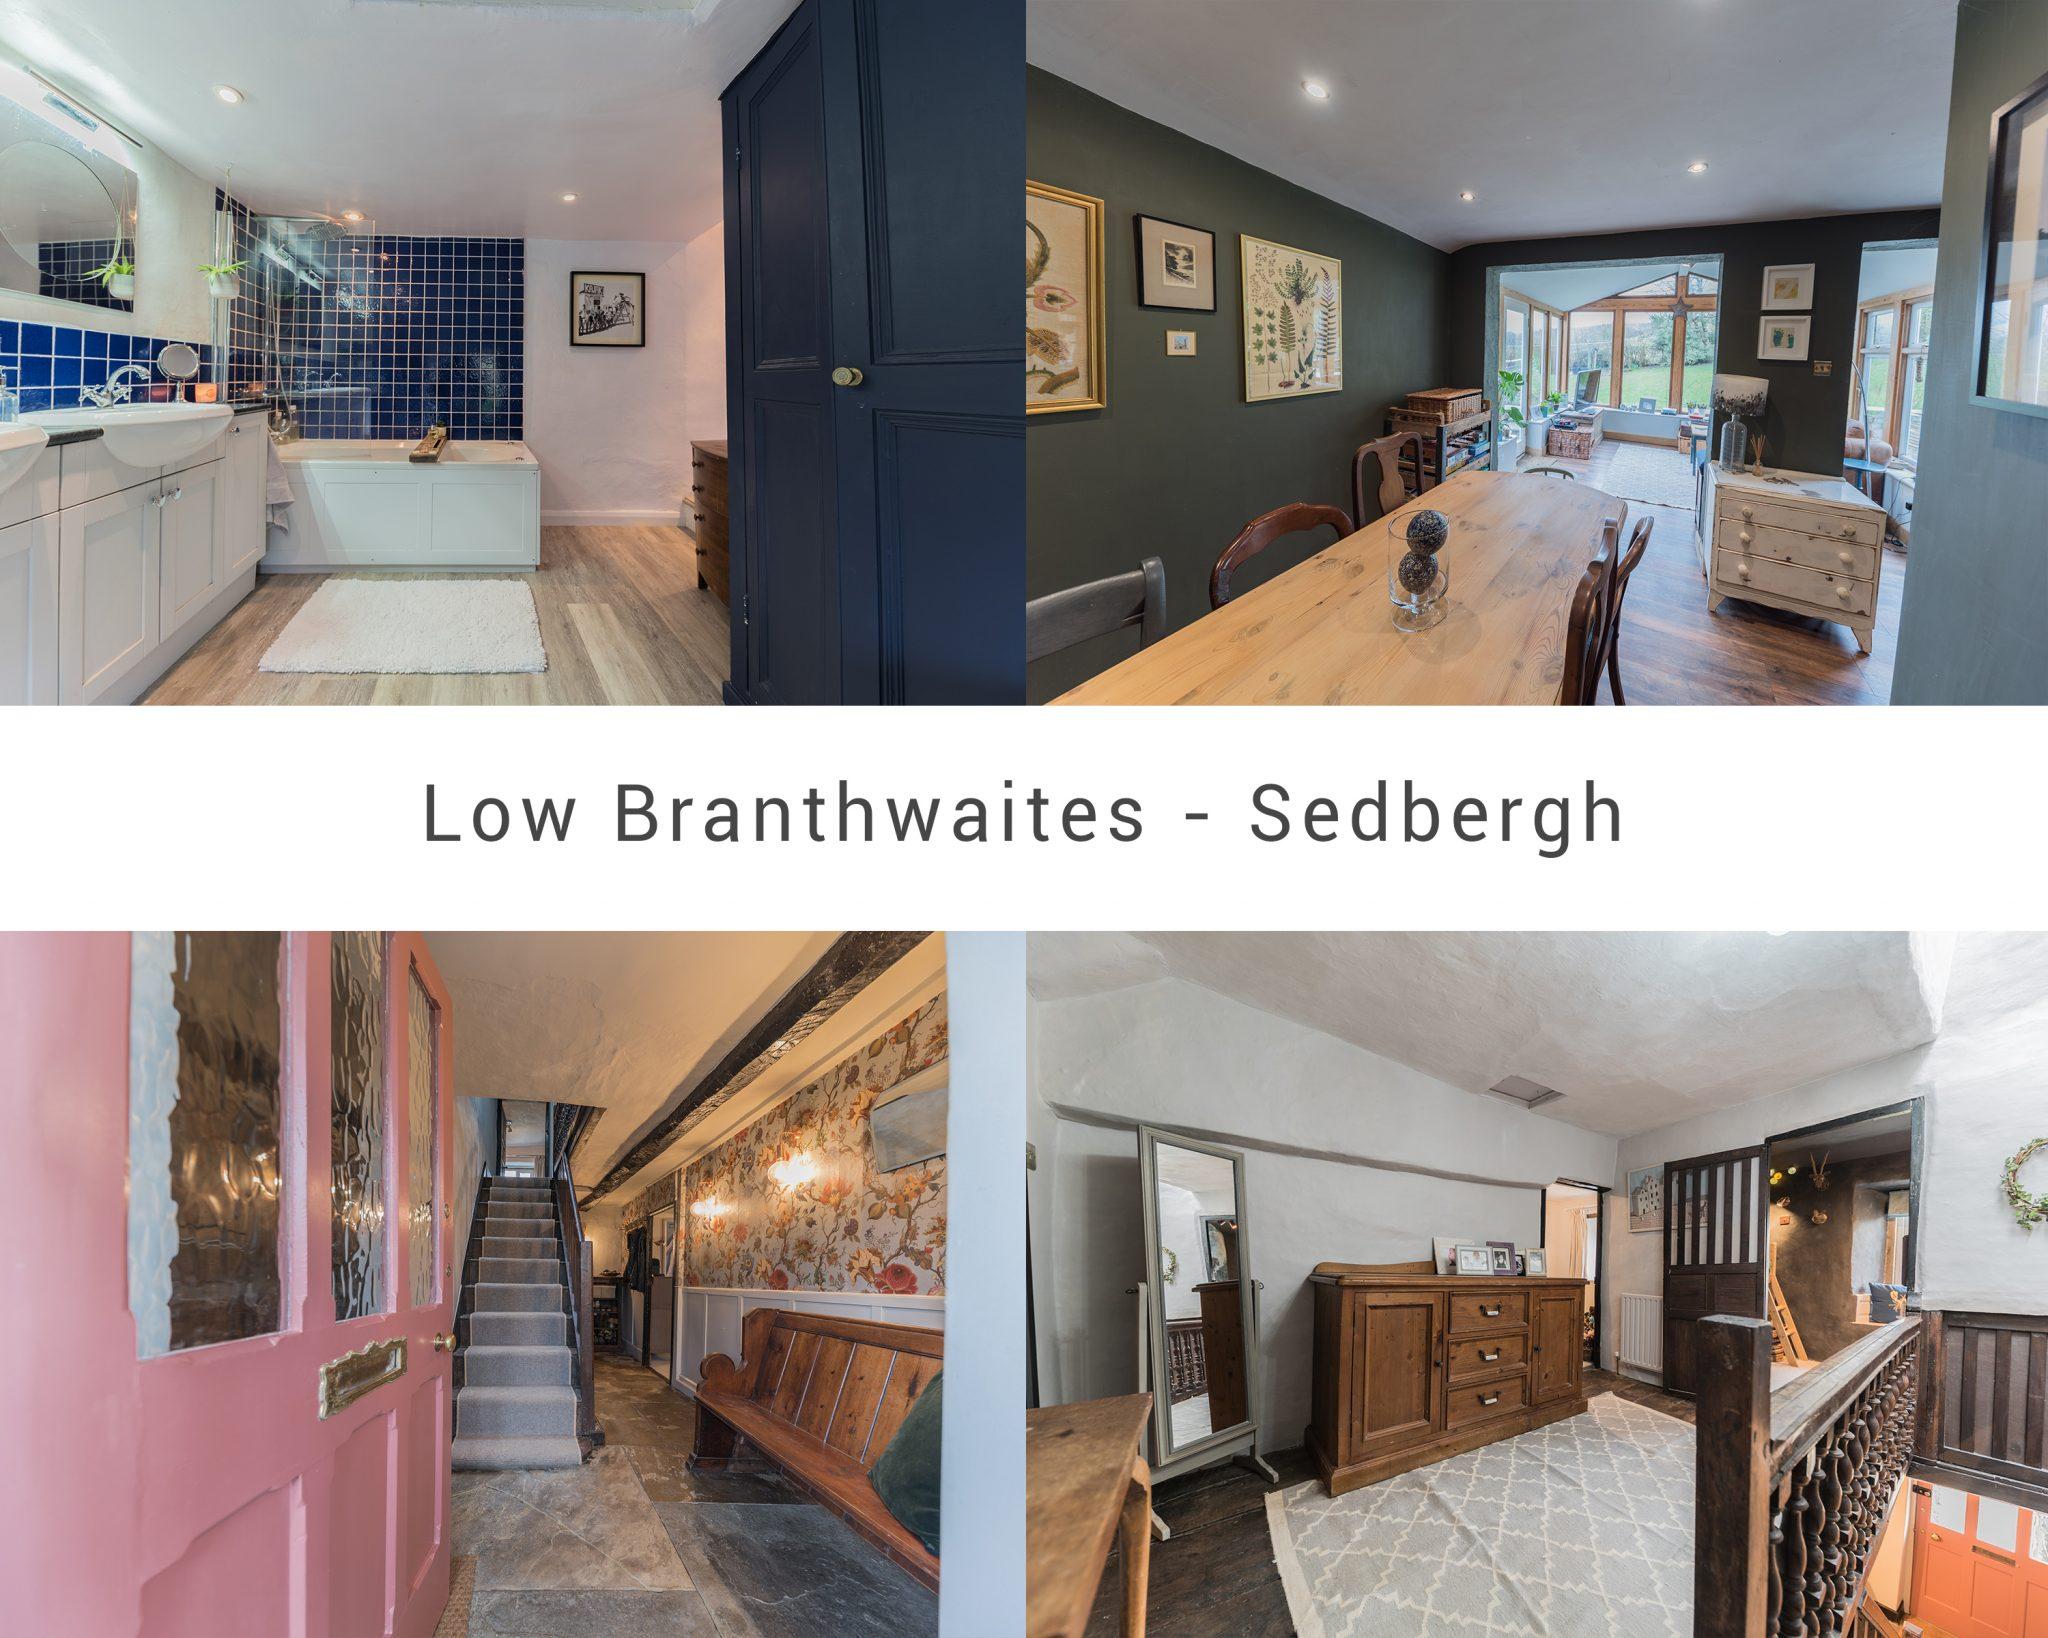 lowbranthwaites